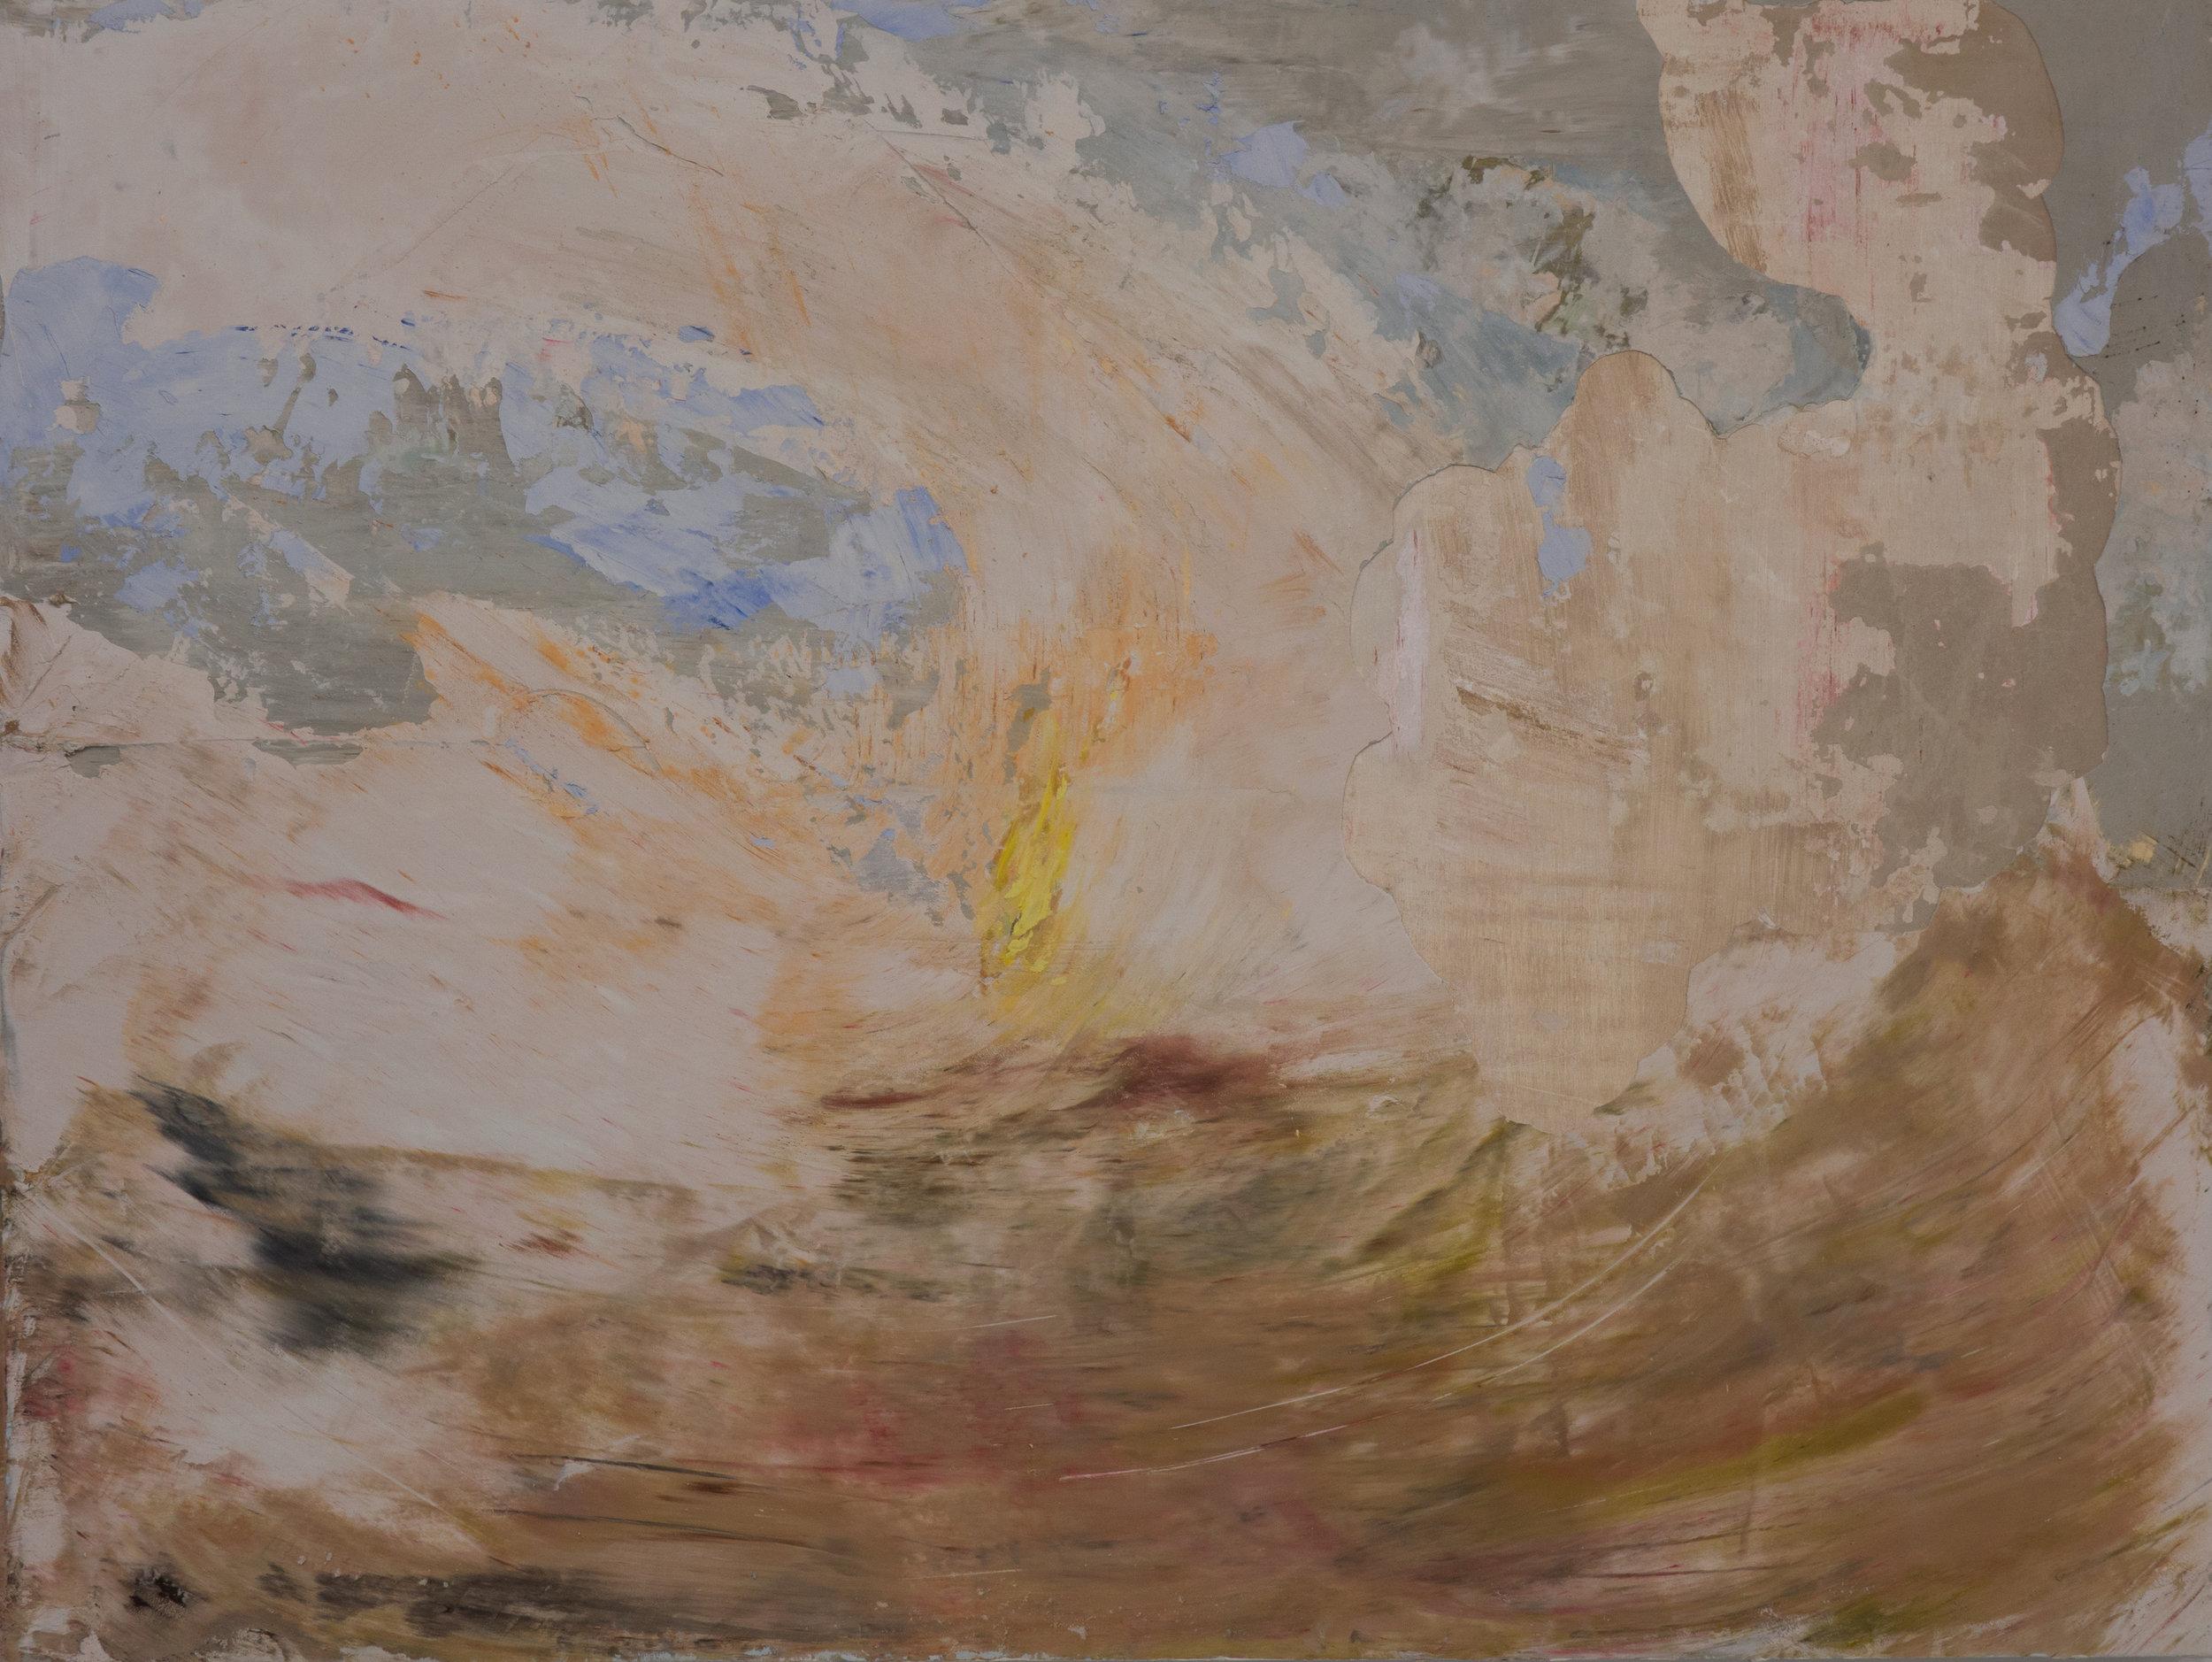 Shelley Vanderbyl - Signal Fire (Day)  (Full Crop) - 2016 - Fresco on Panel - 30x40.jpg